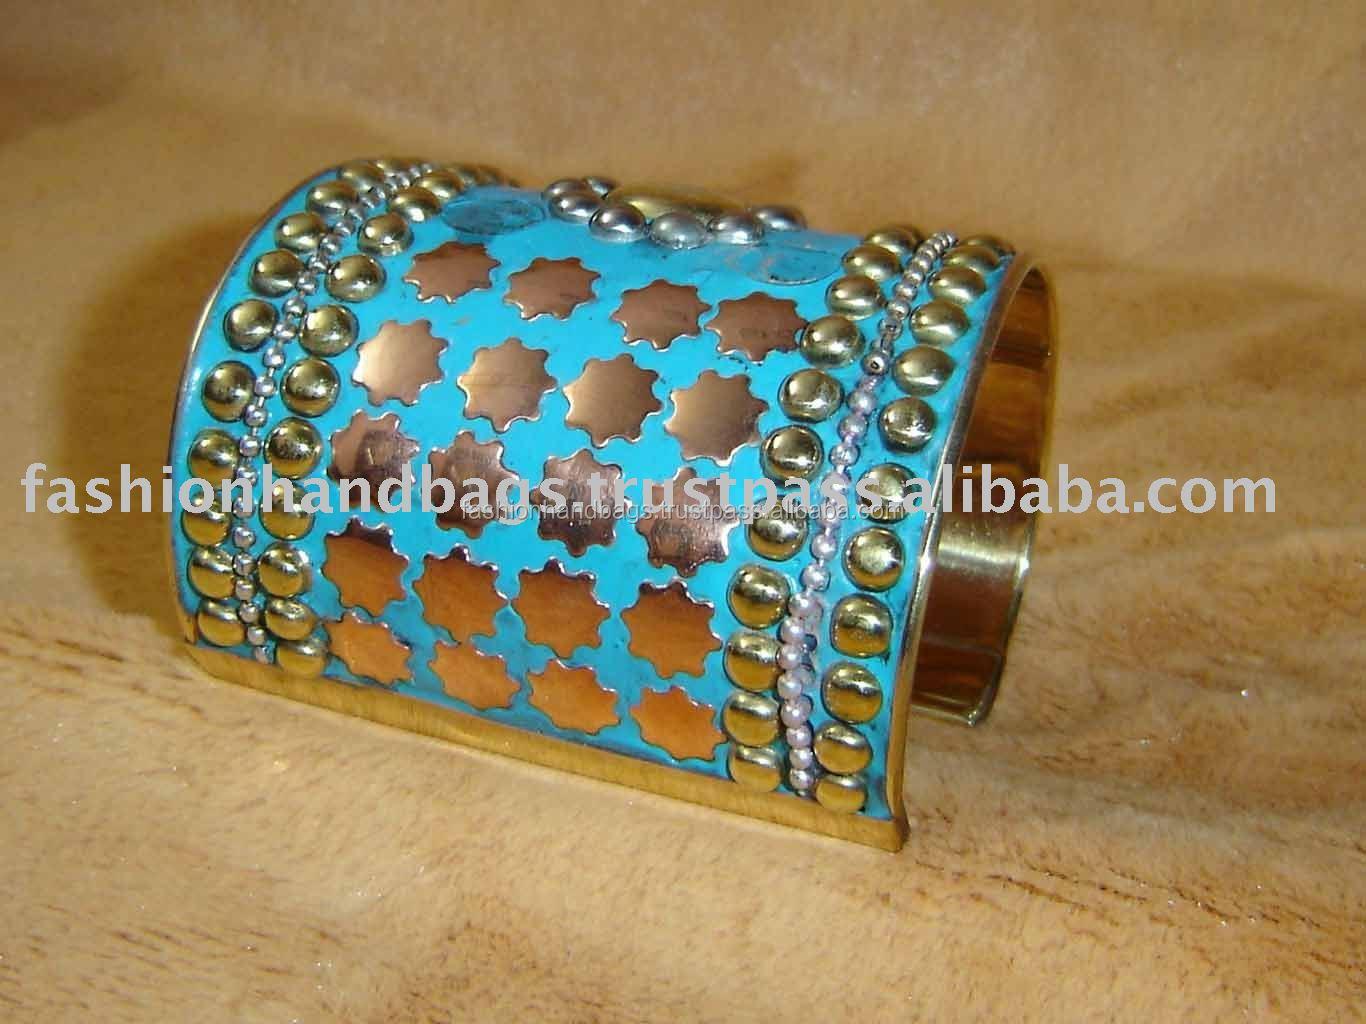 Bangle Stand Designs : Indian bangle stand buy designs make